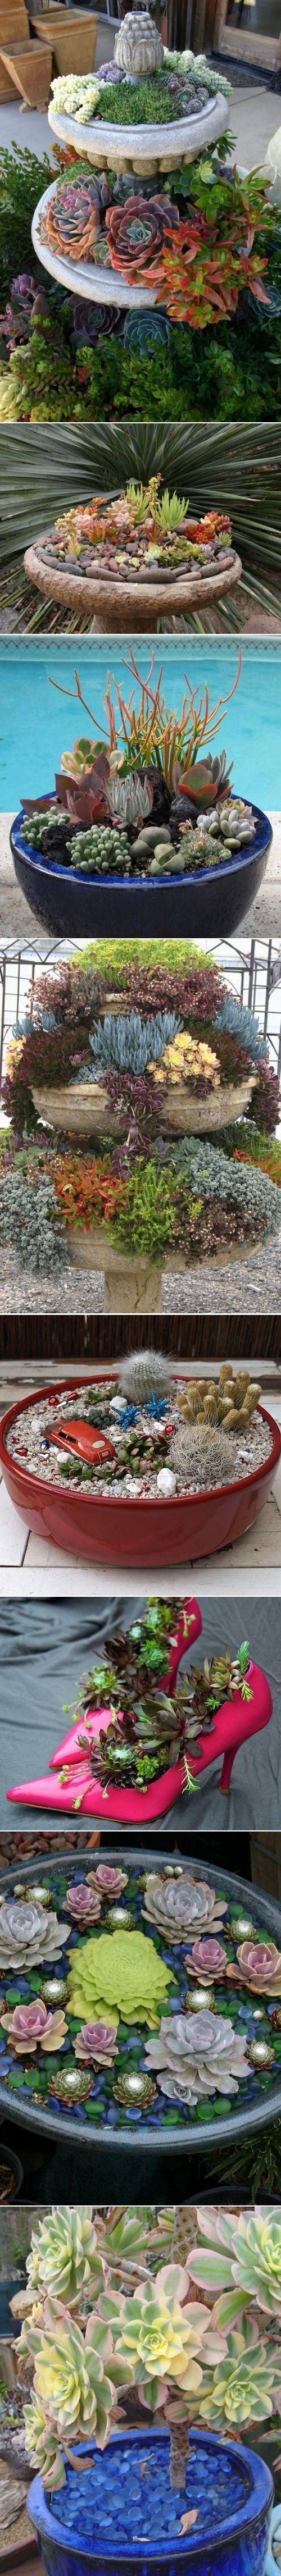 DIY Succulent Garden Ideas